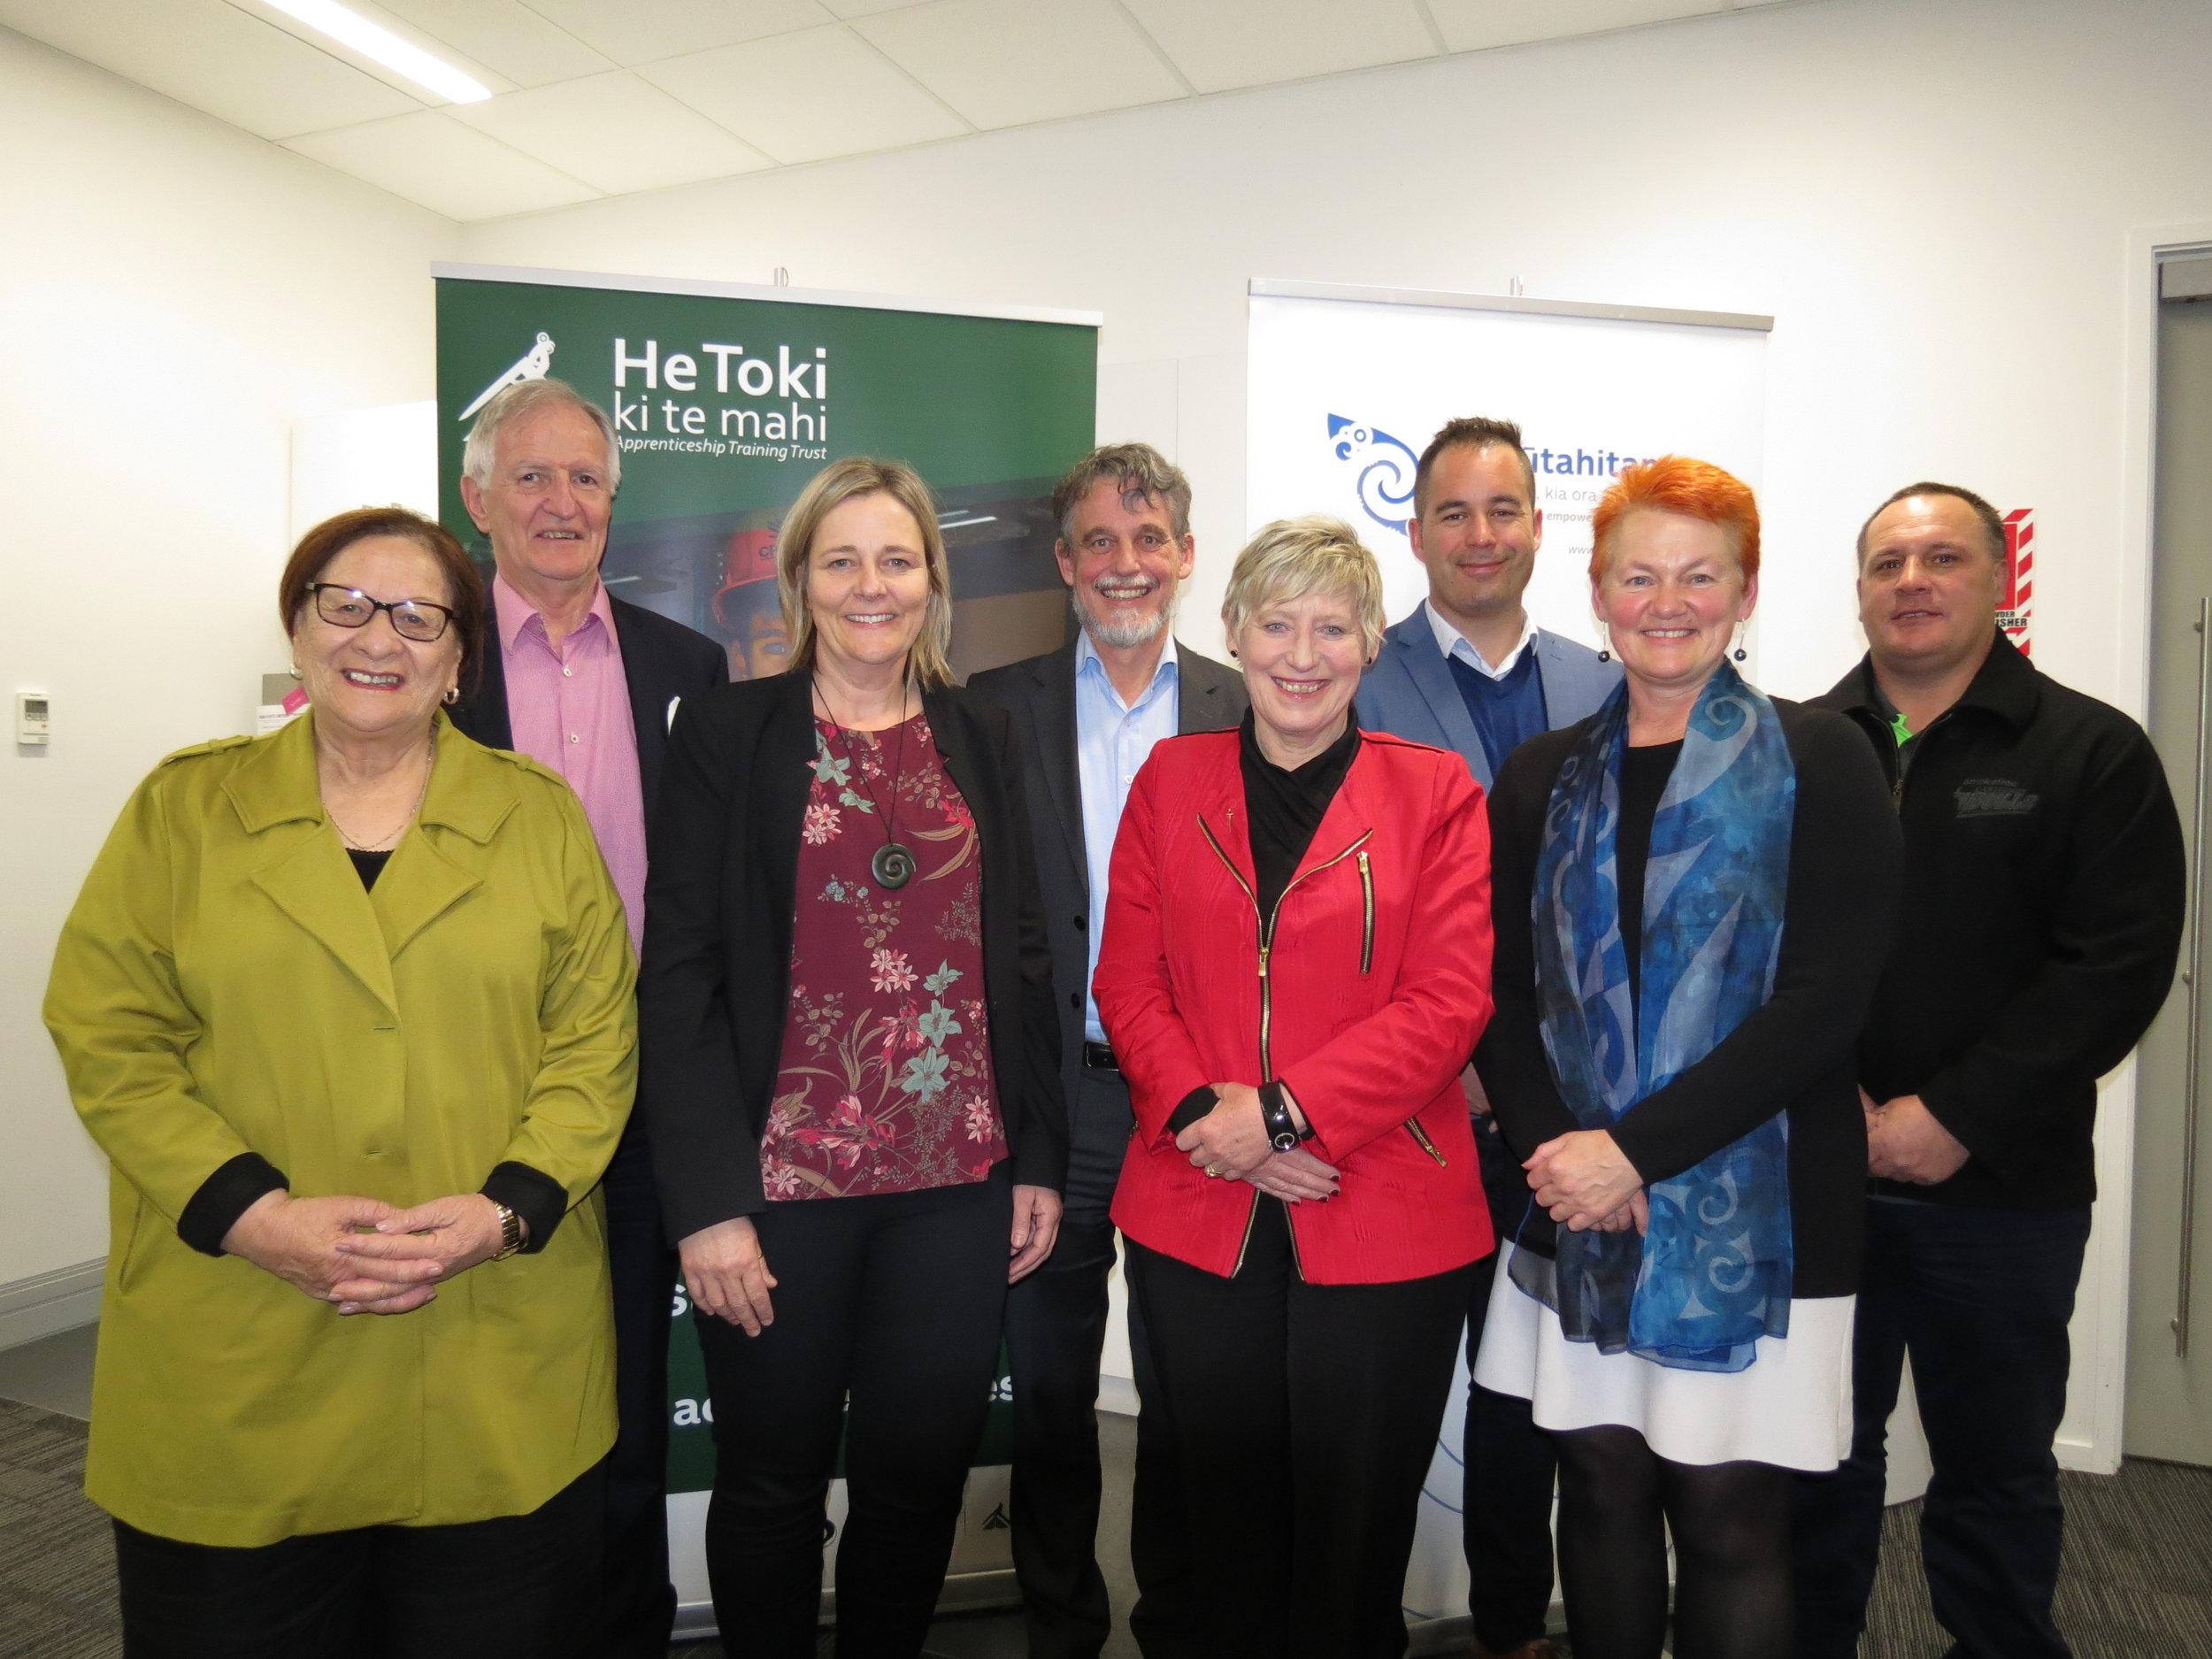 Board Chairs: Molly Luke and Trevor Taylor; Dr Catherine Savage, Professor Paul Dalziell, Hon Lianne Dalziell, Mayor of Christchurch, Eruera Tarena, Helen Leahy, Mathias Pitama